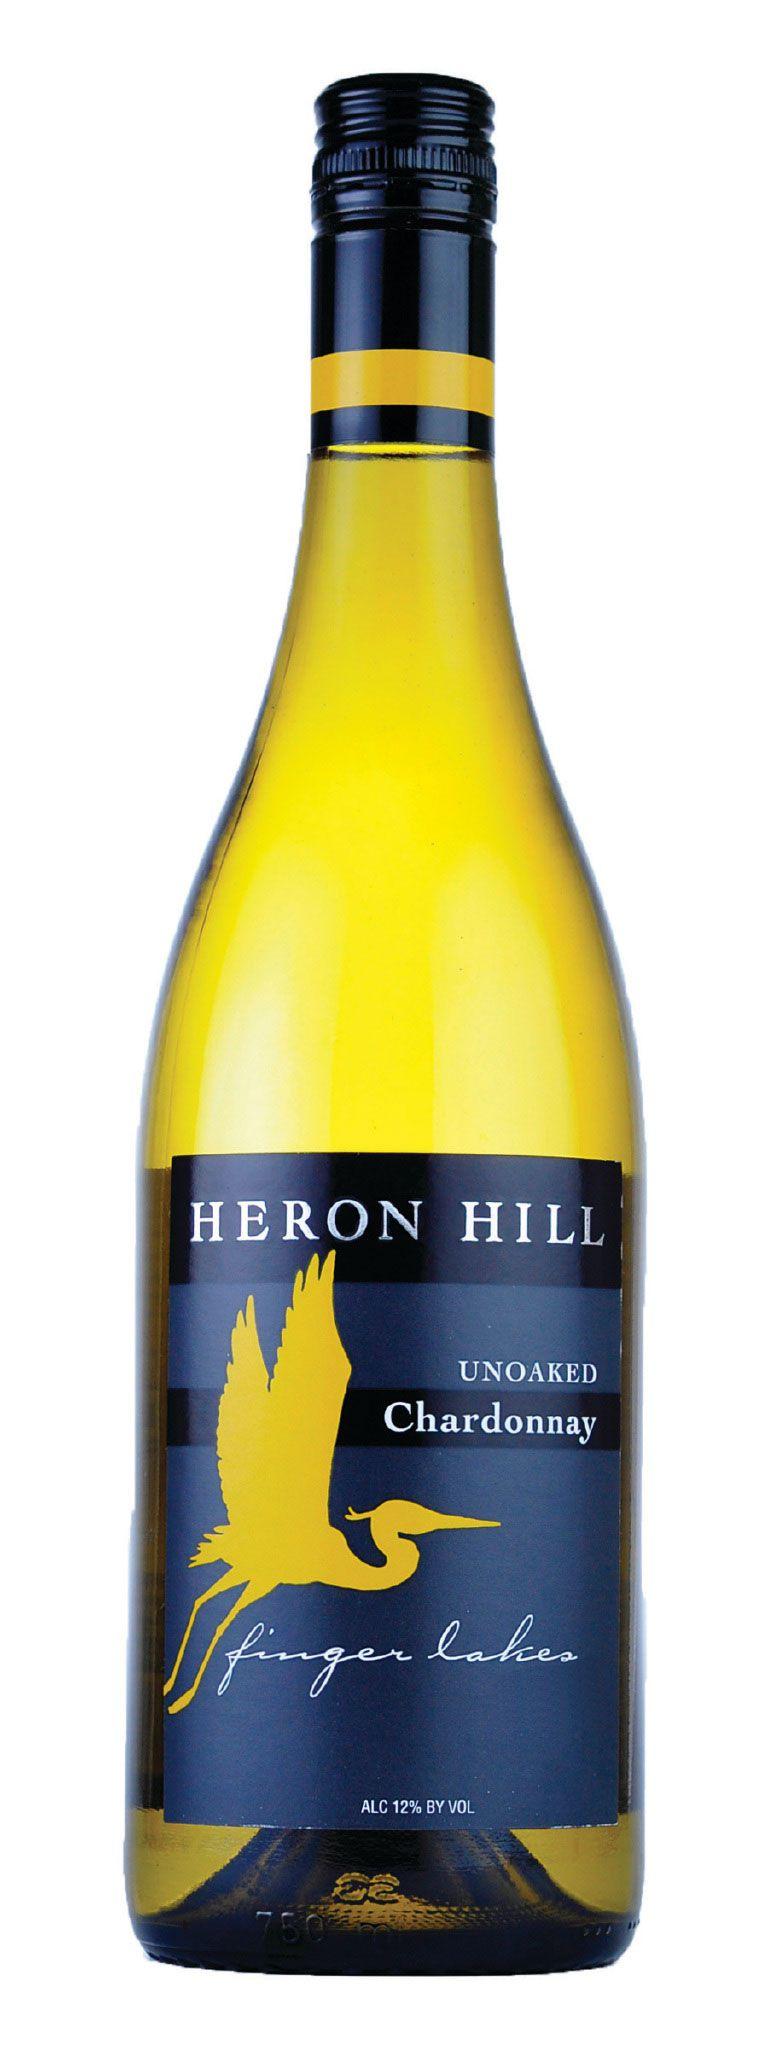 Heron Hill Chardonnay